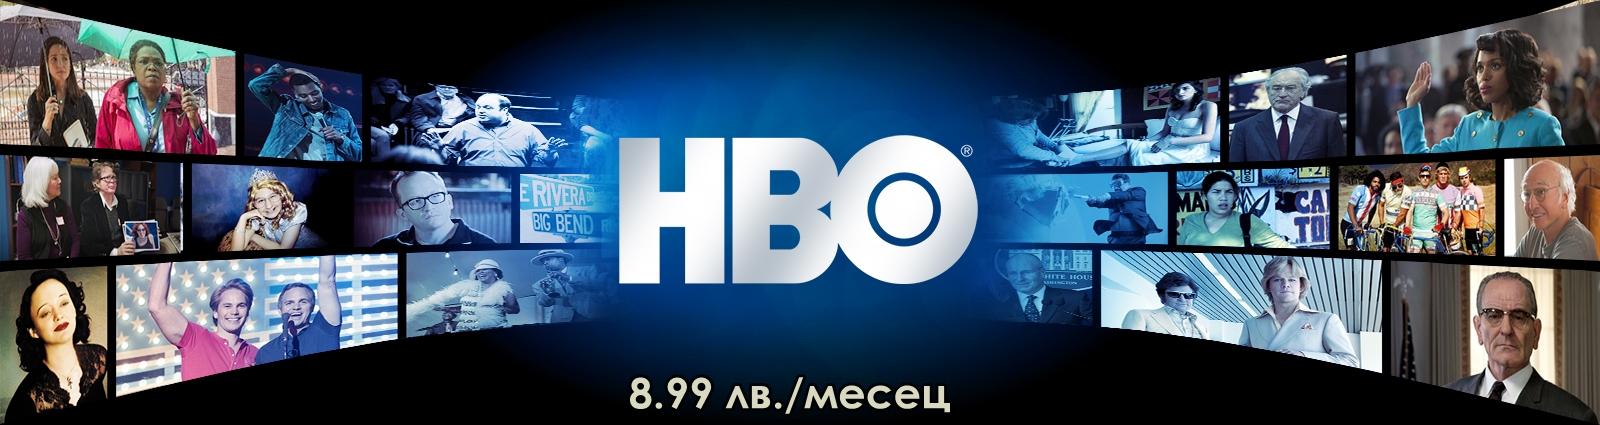 HBO Banner